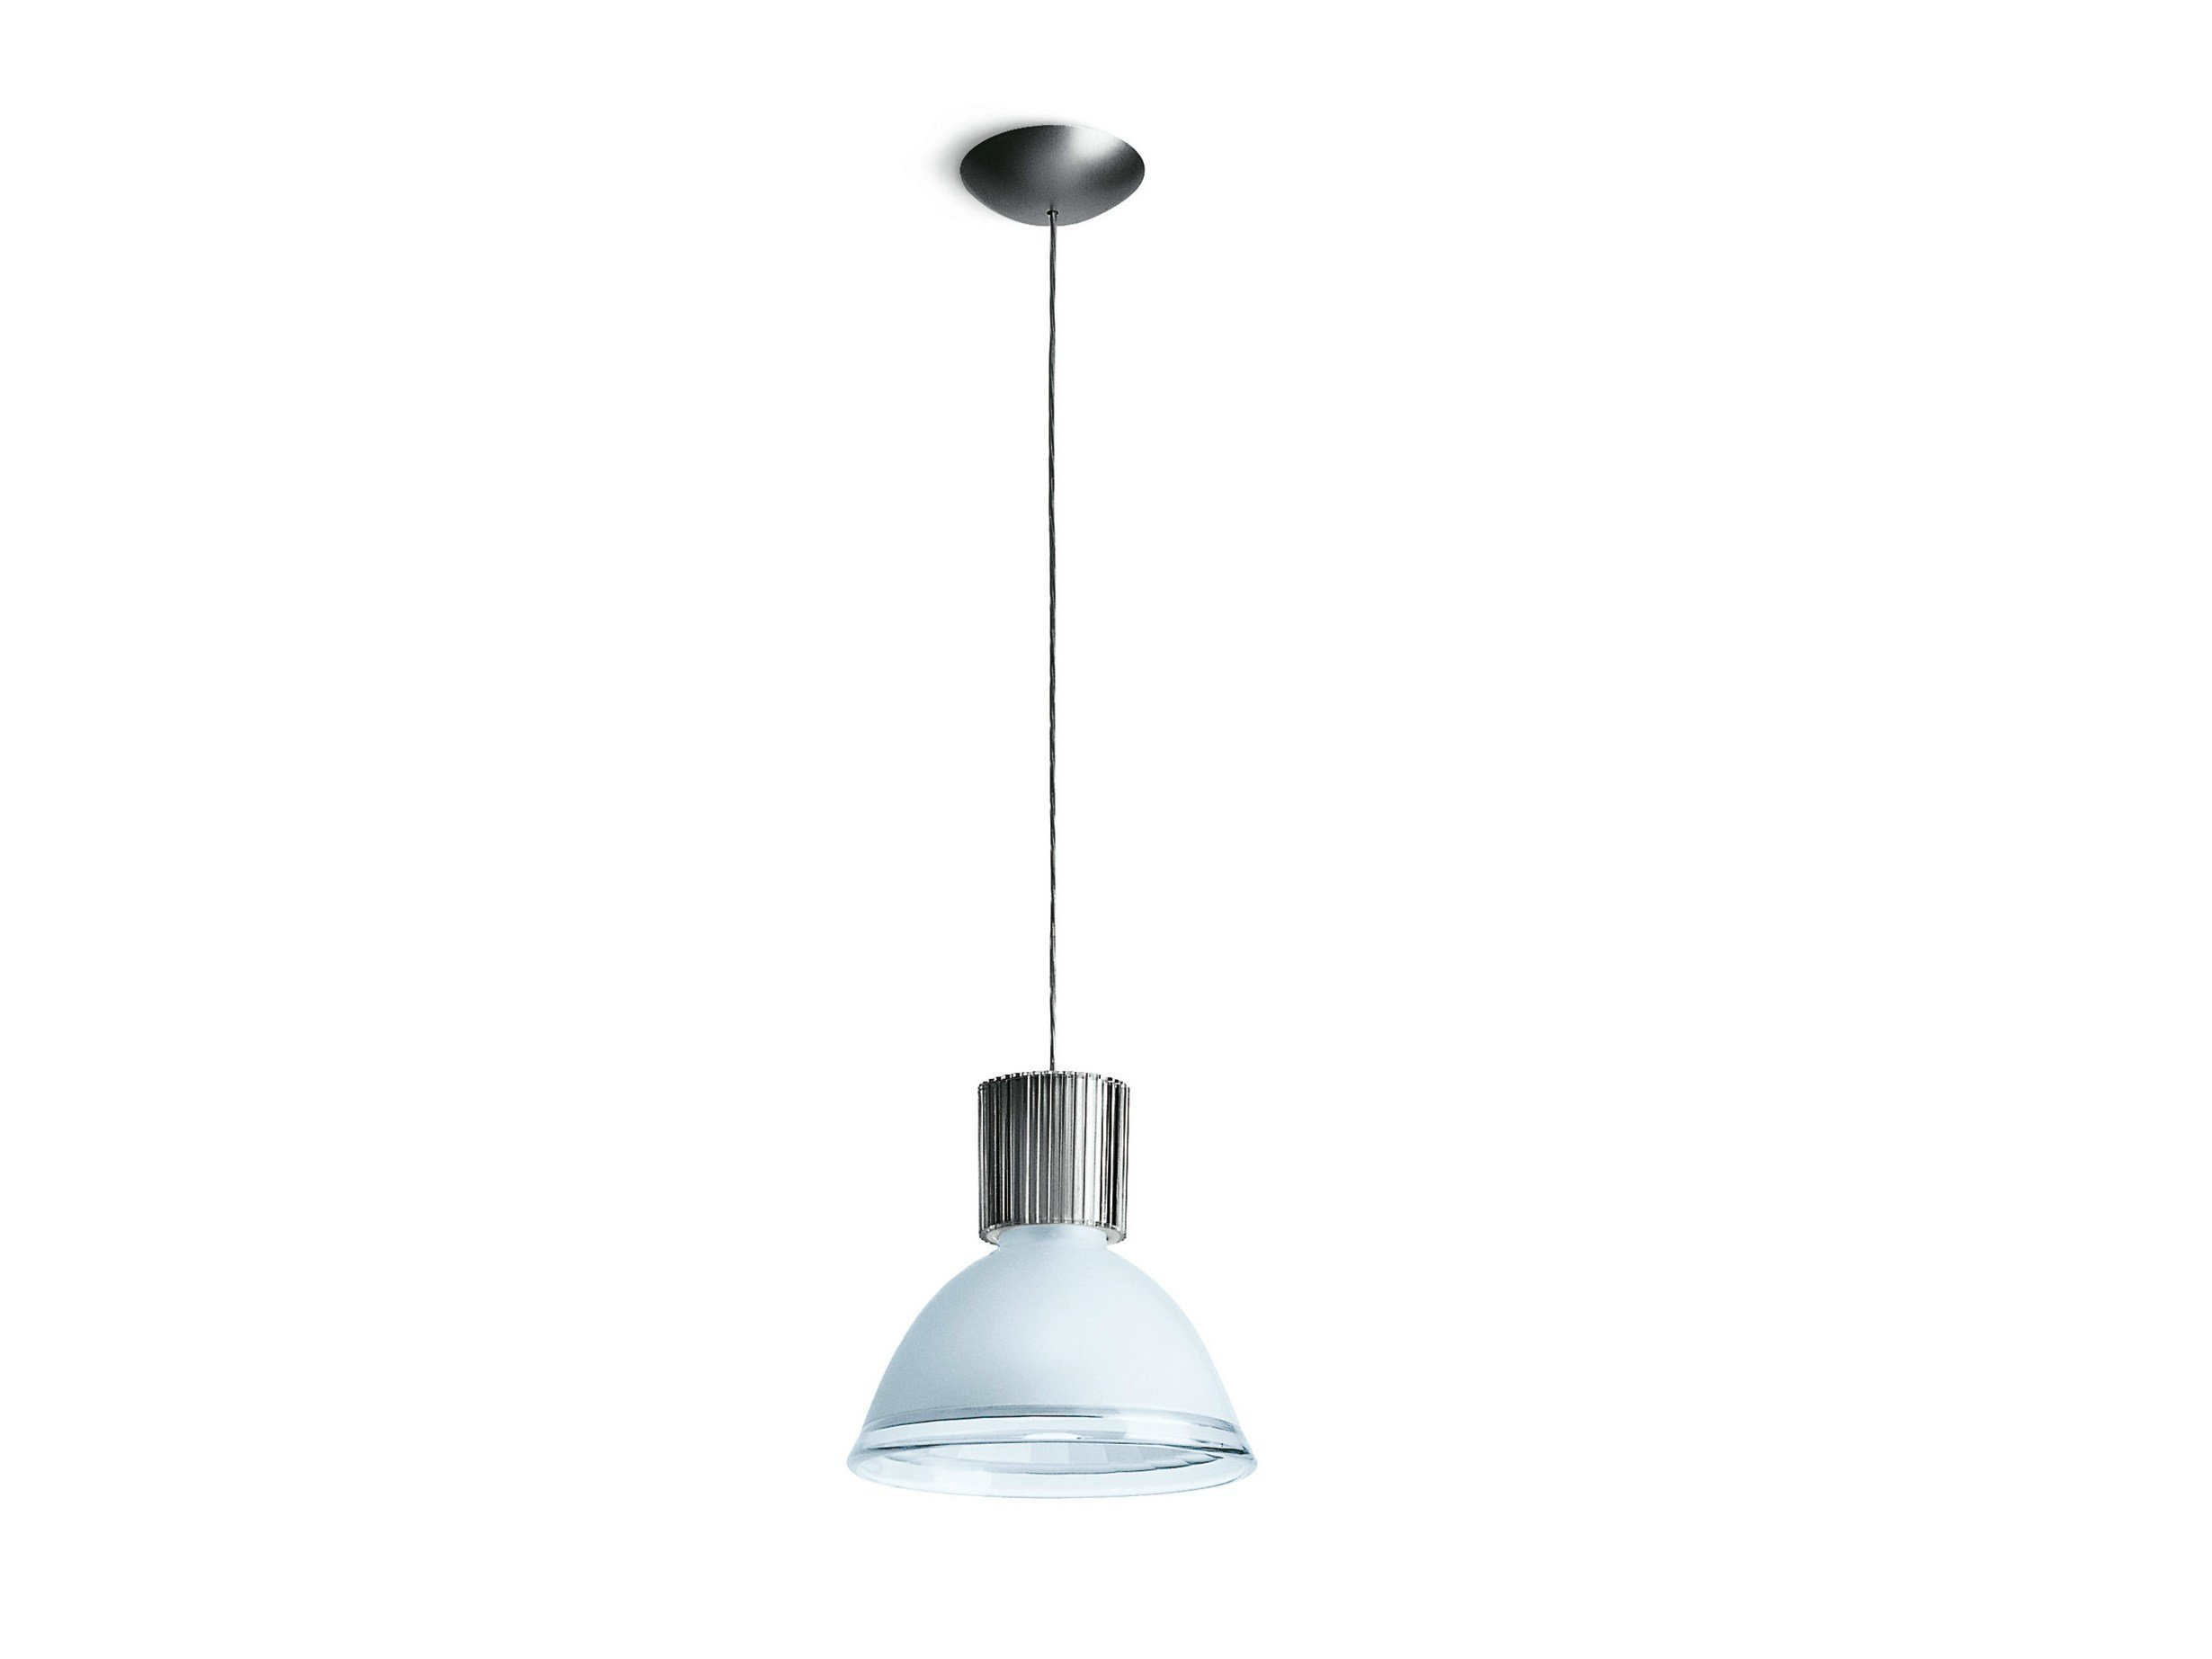 Direct light aluminium pendant lamp CENTRAL by iGuzzini Illuminazione design Vignelli Associates ...